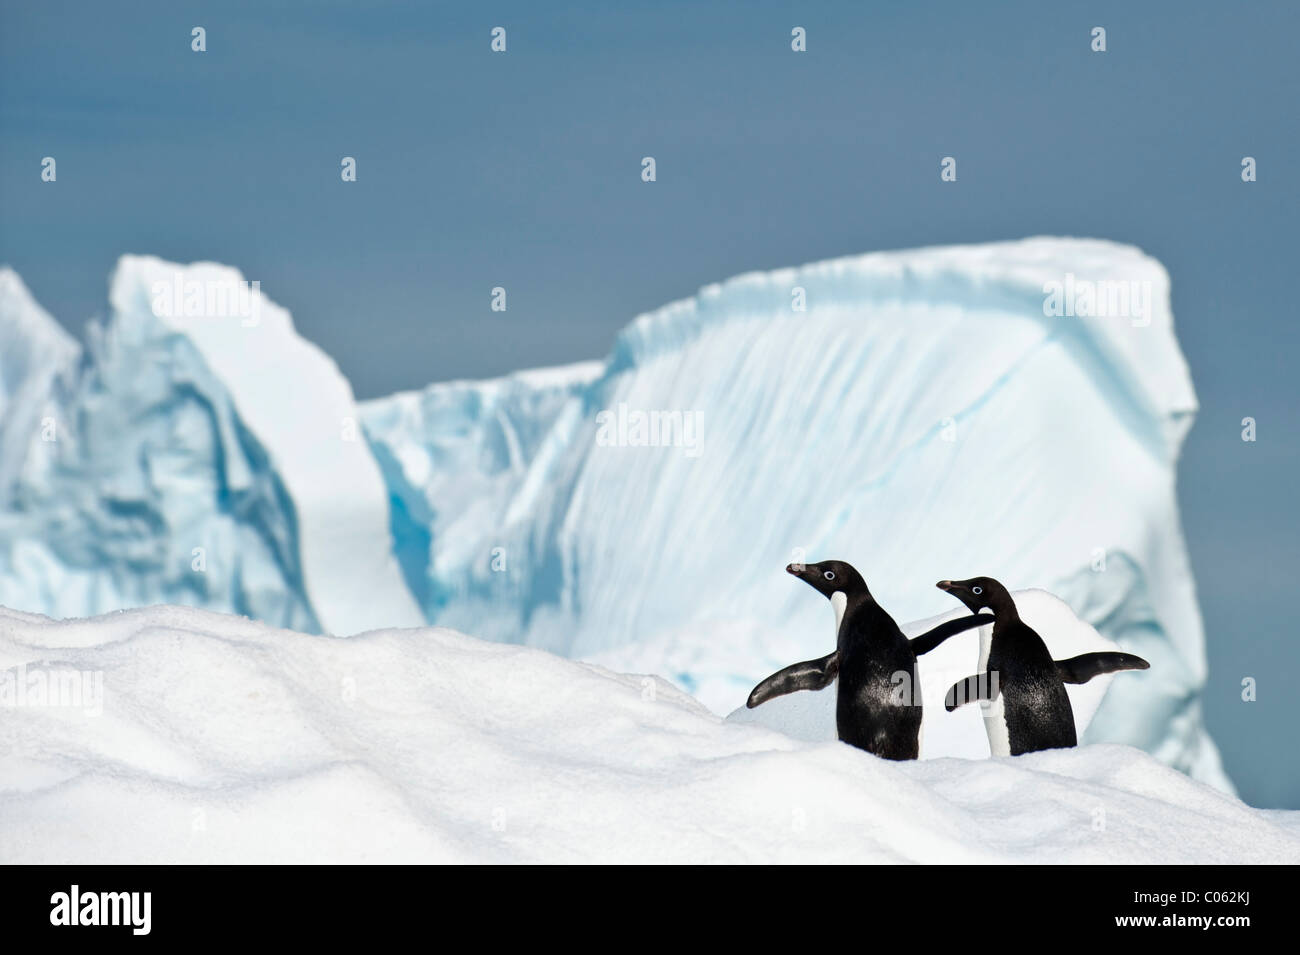 Adelie Penguins (Pygoscelis adeliae) on ice berg. Yalour Islands, Antarctic Peninsula, Antarctica. - Stock Image